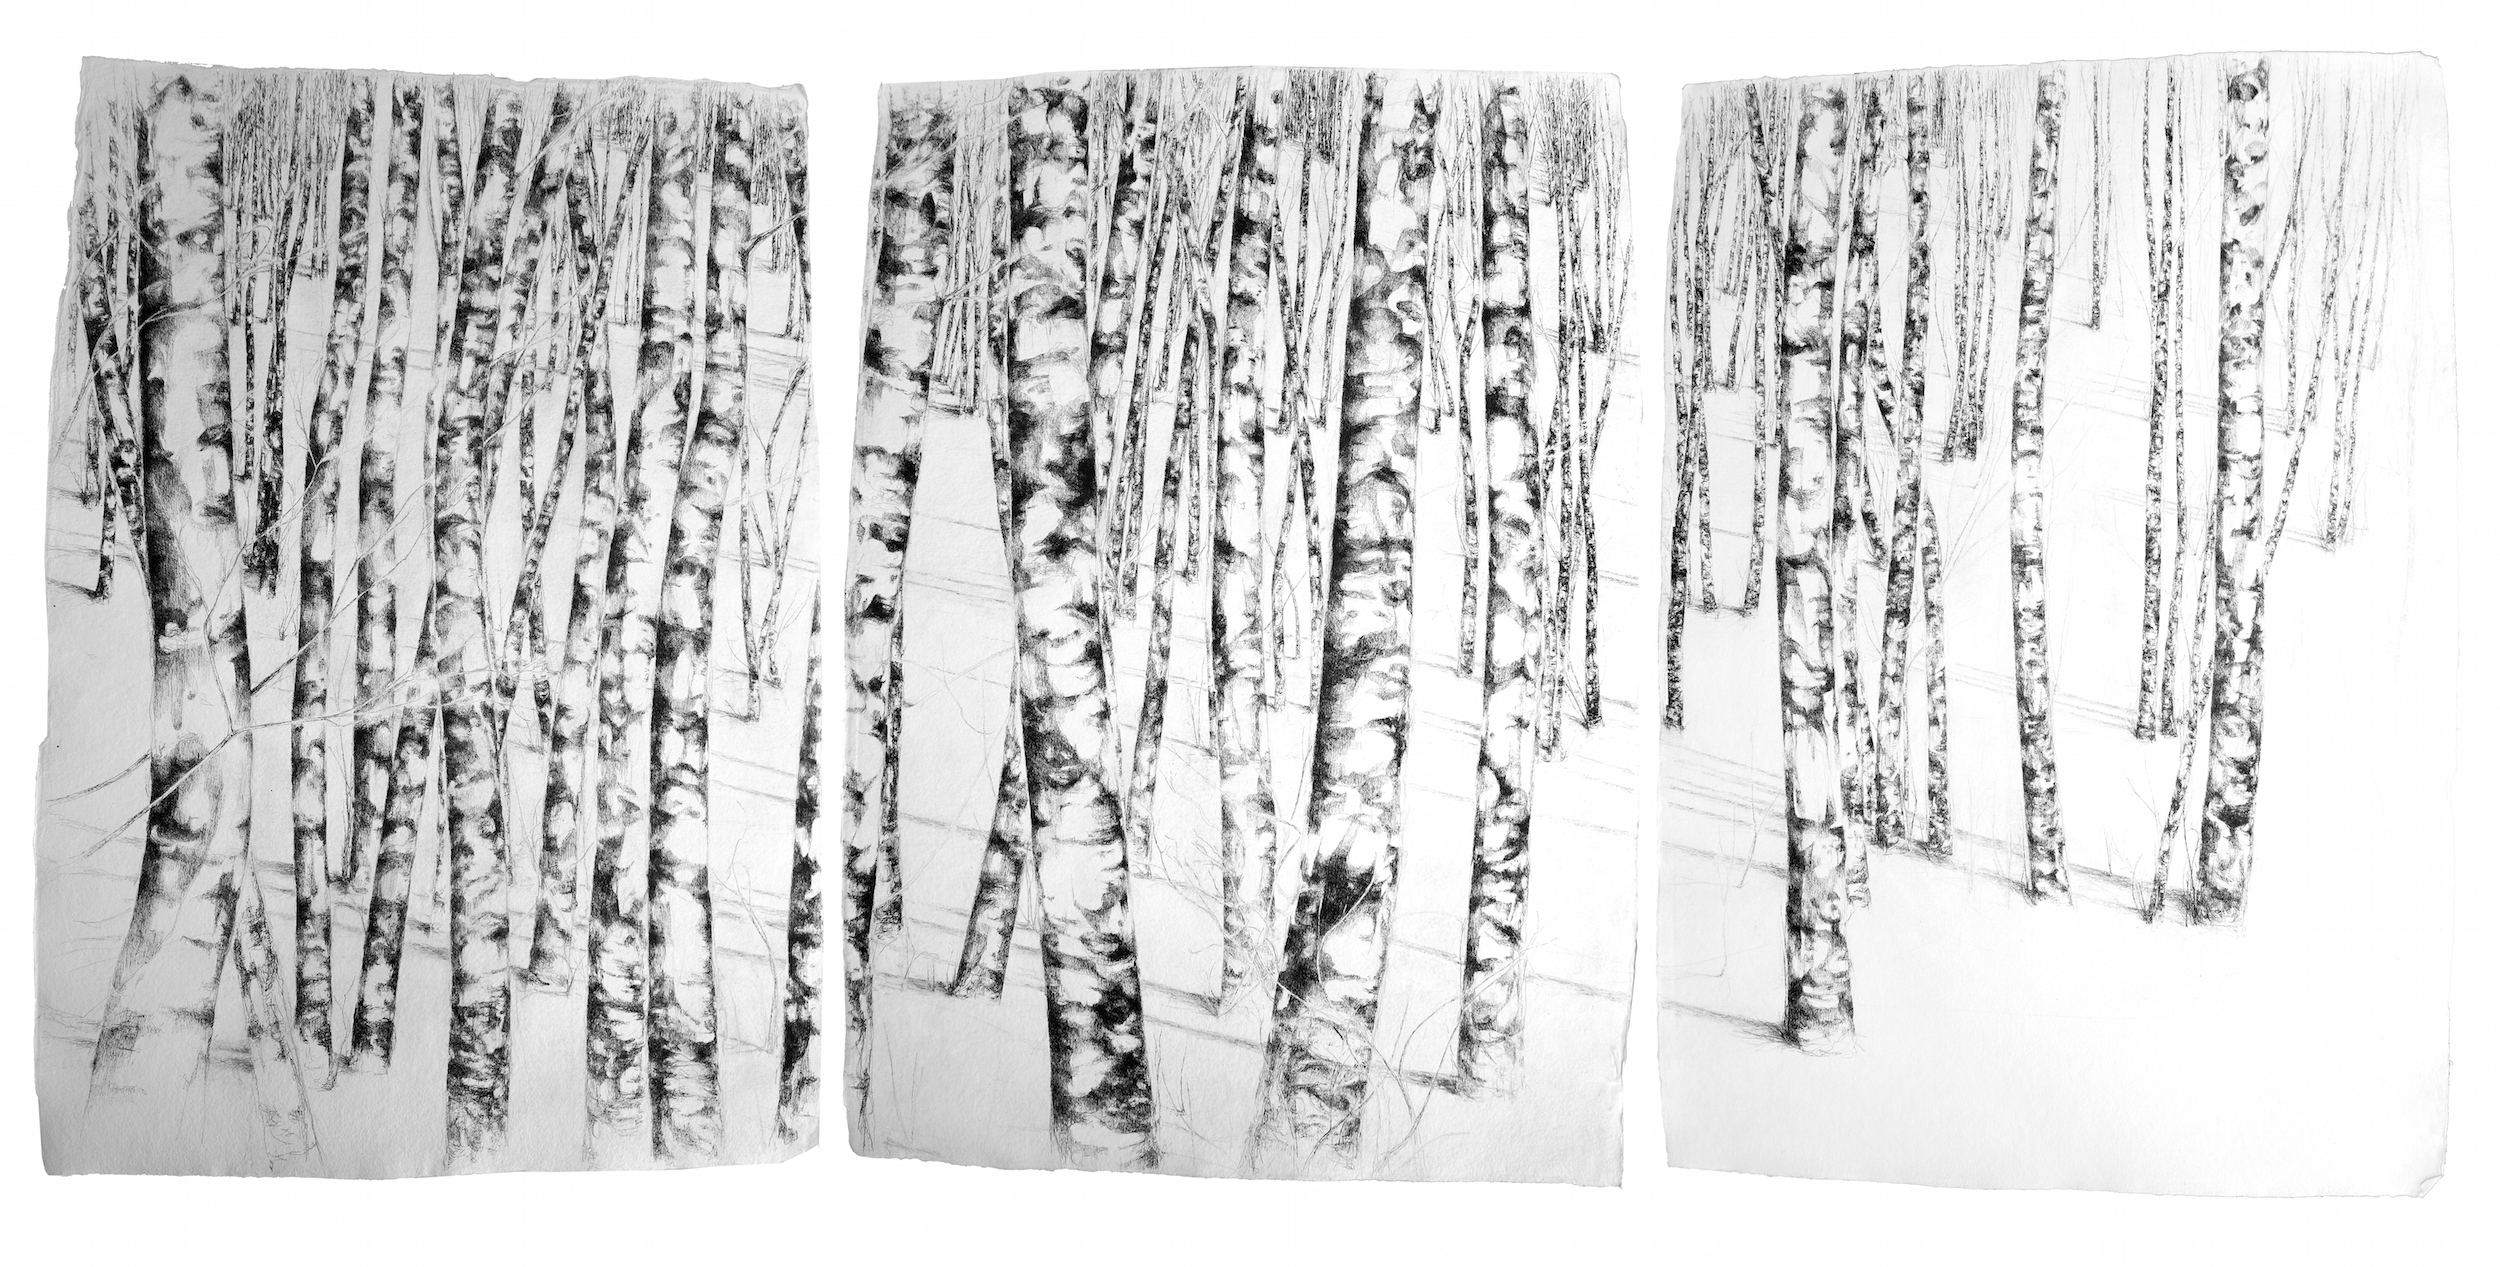 Artist: Solange Leon Iriarte  Title: Lloyd Wright Triptych  Medium: Pencil and ink  Size: 95 x 285 cm  Price: £5500